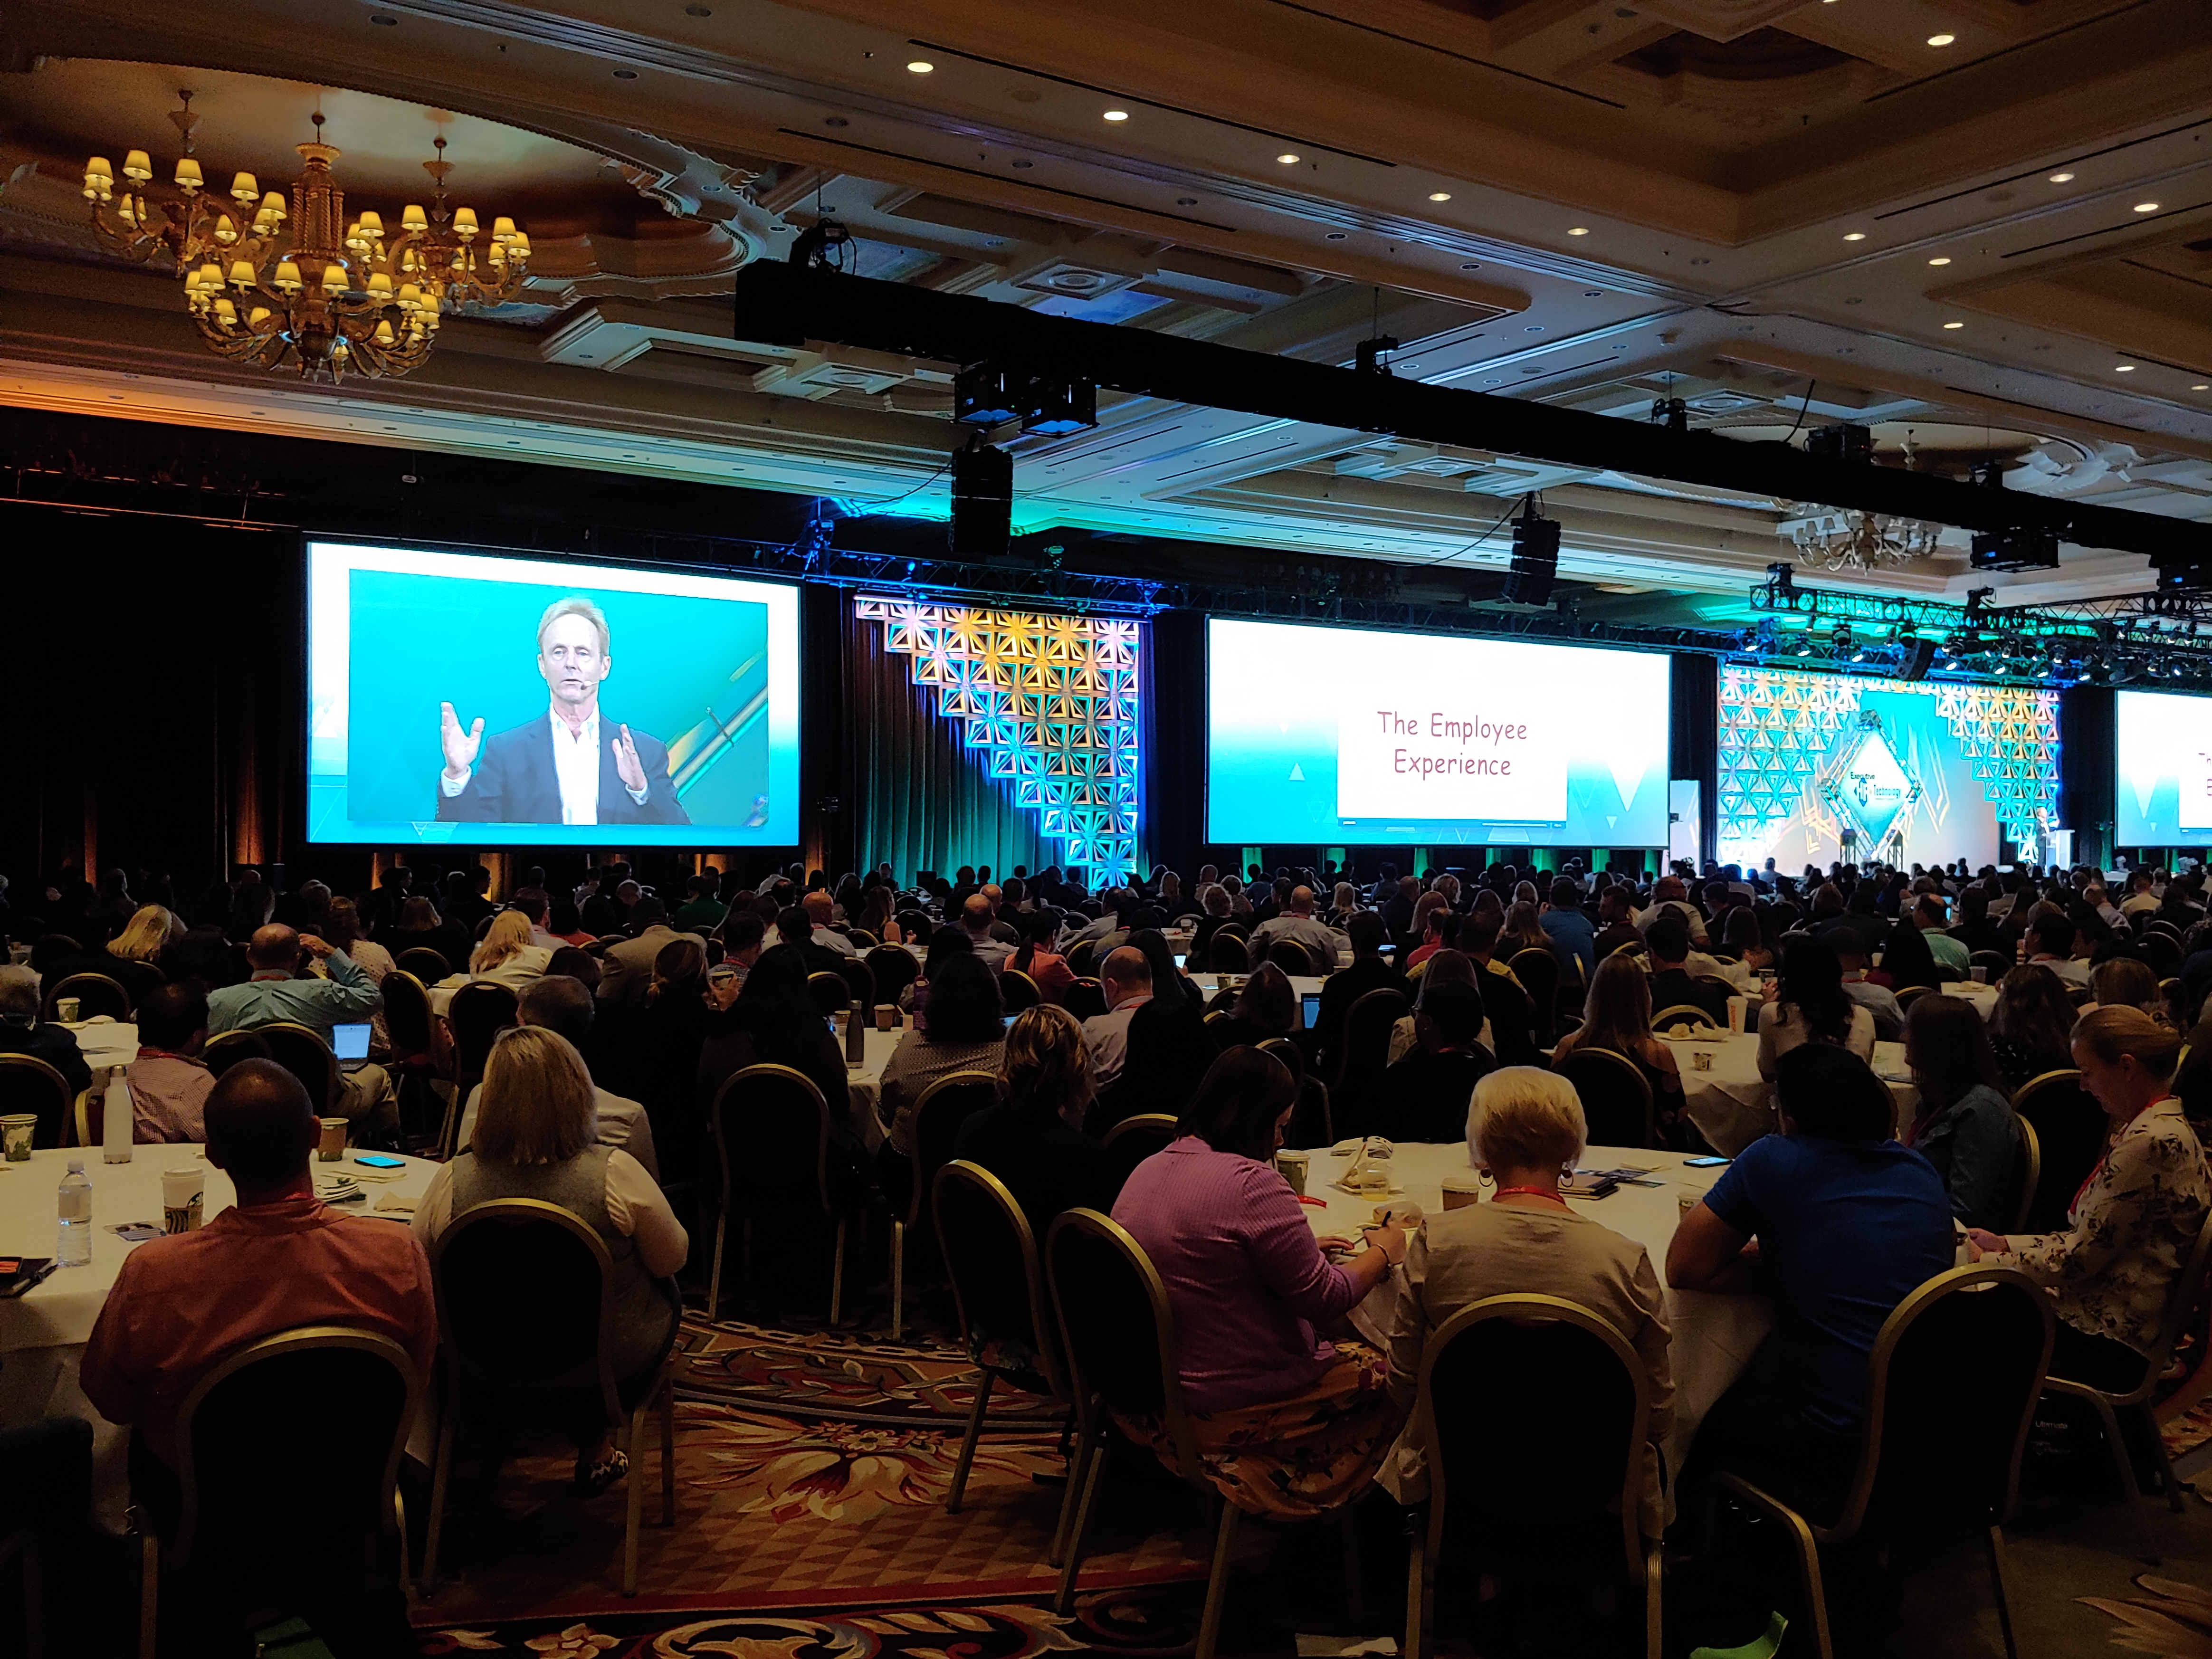 HR Tech 2019: Top Trends From Josh Bersin's Keynote Address